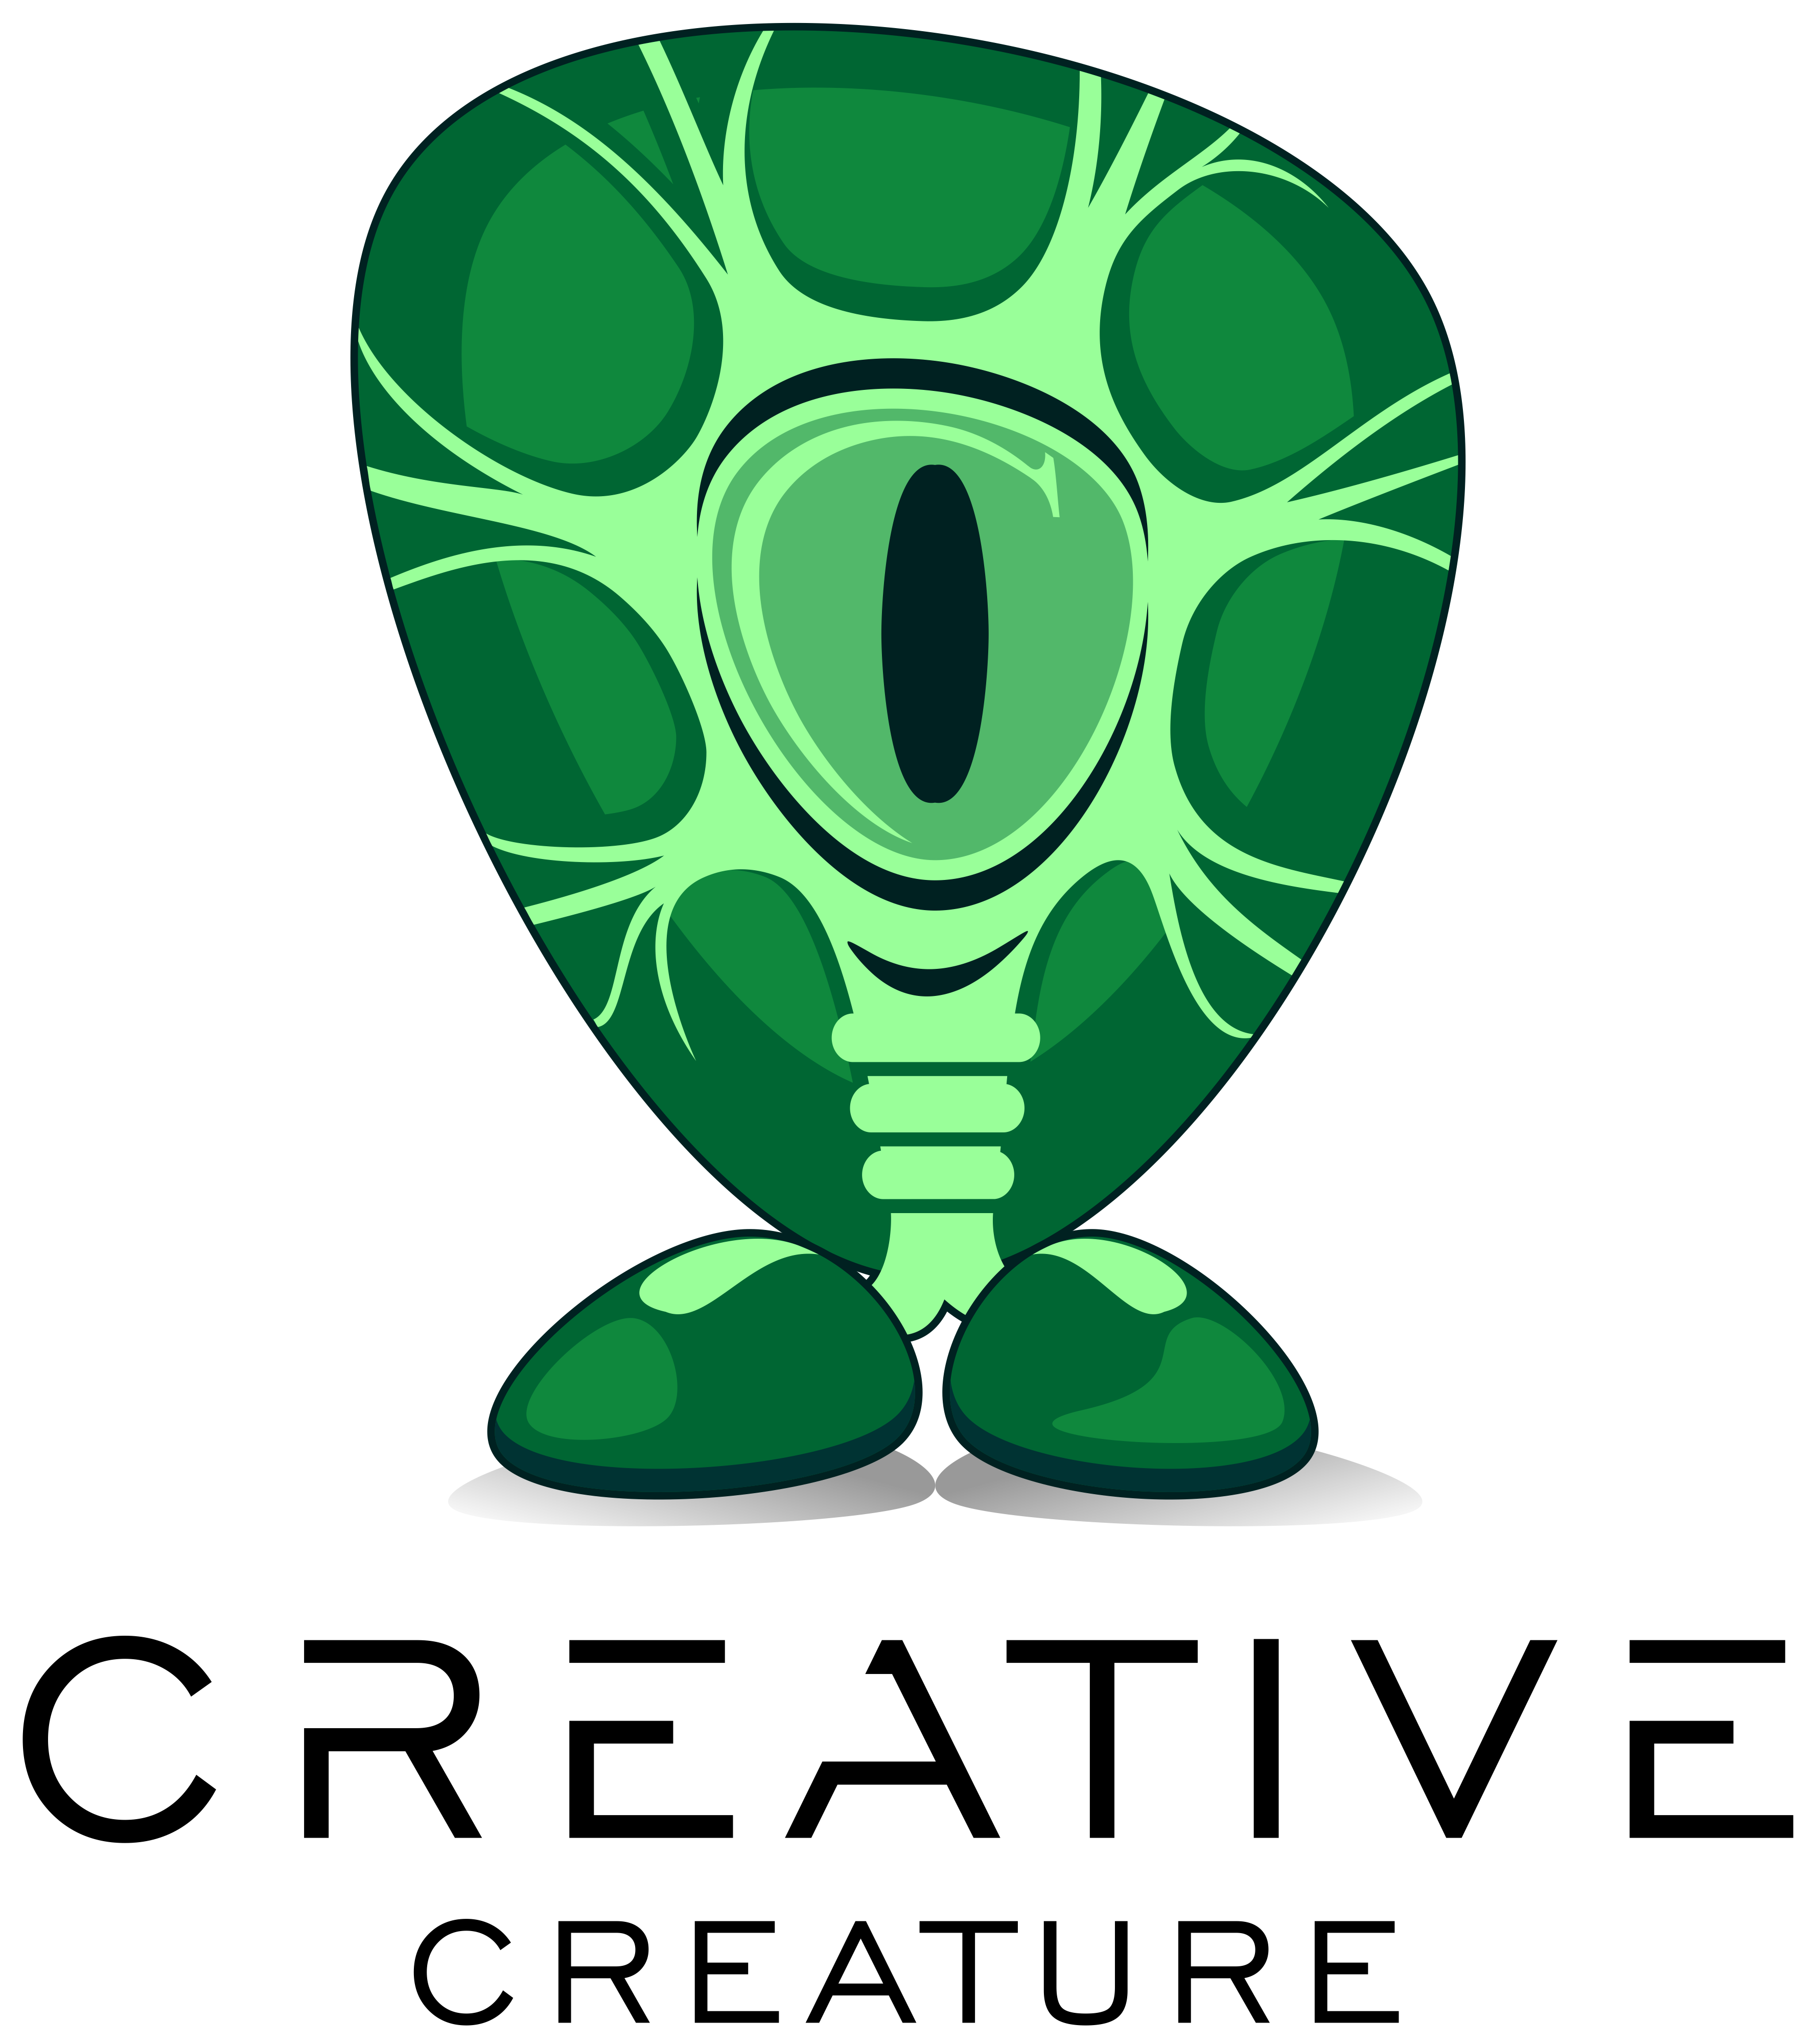 Create a logo for a new creative tech startup!